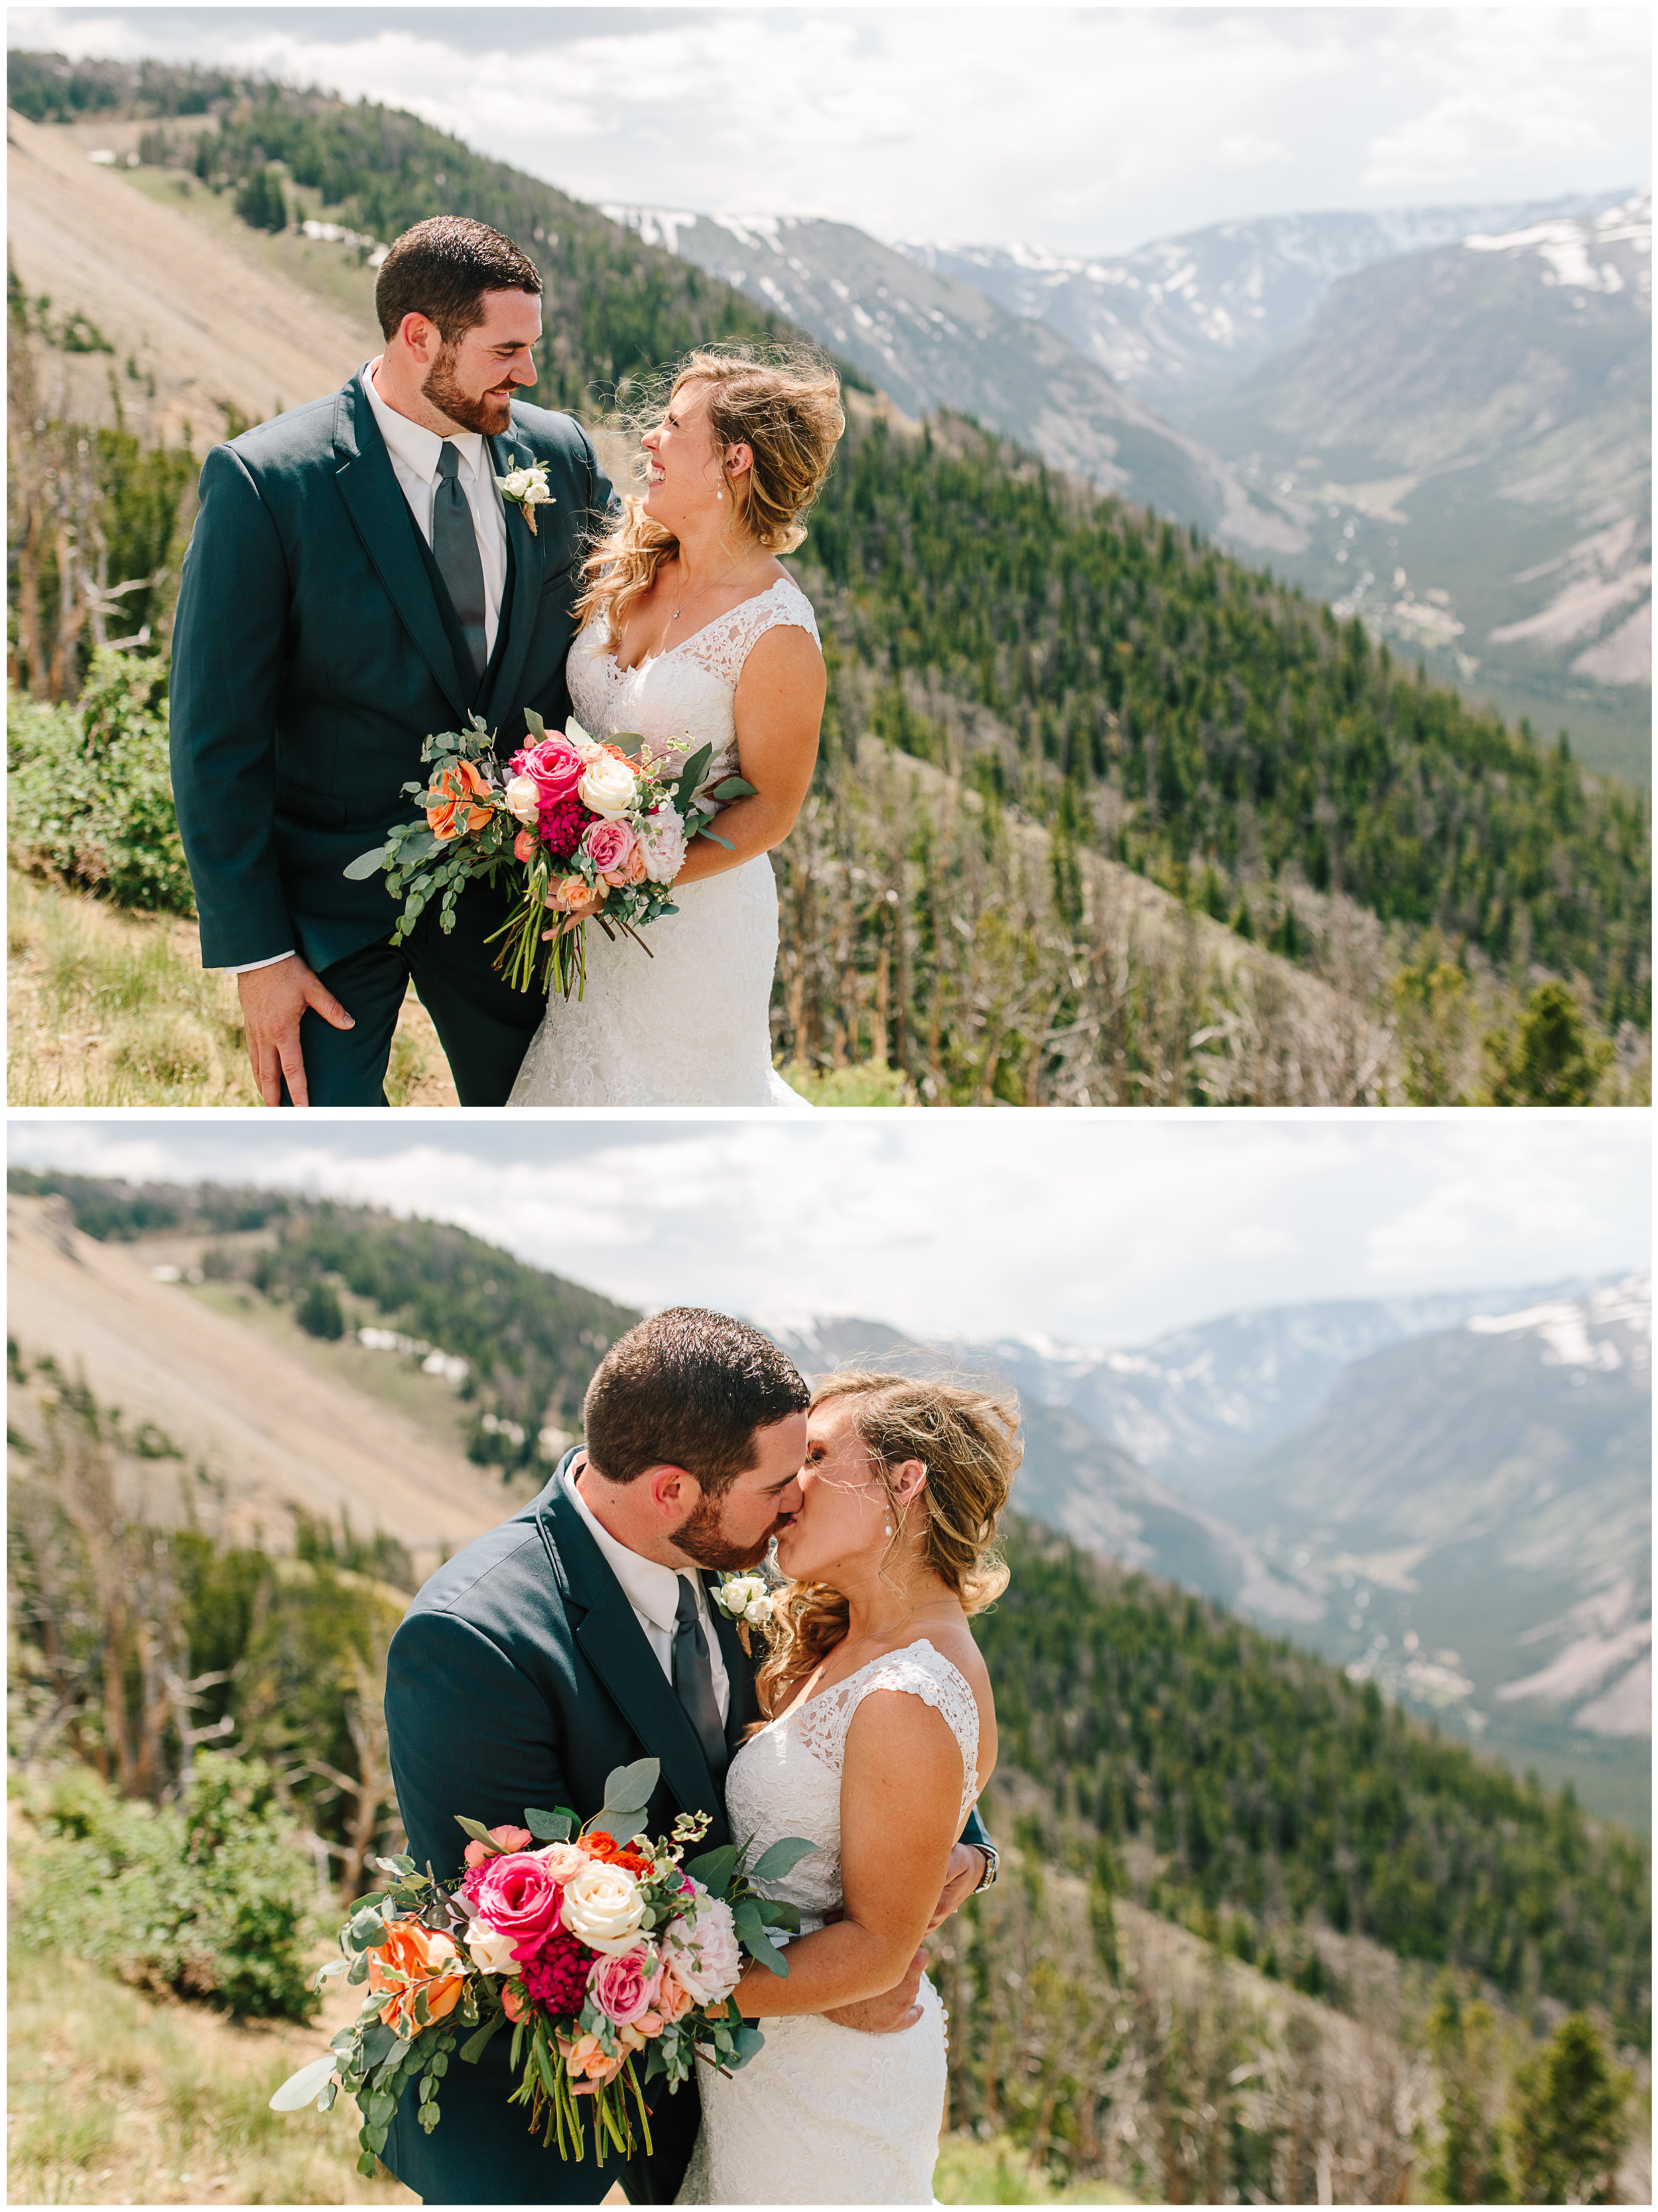 redlodge_montana_wedding_32.jpg